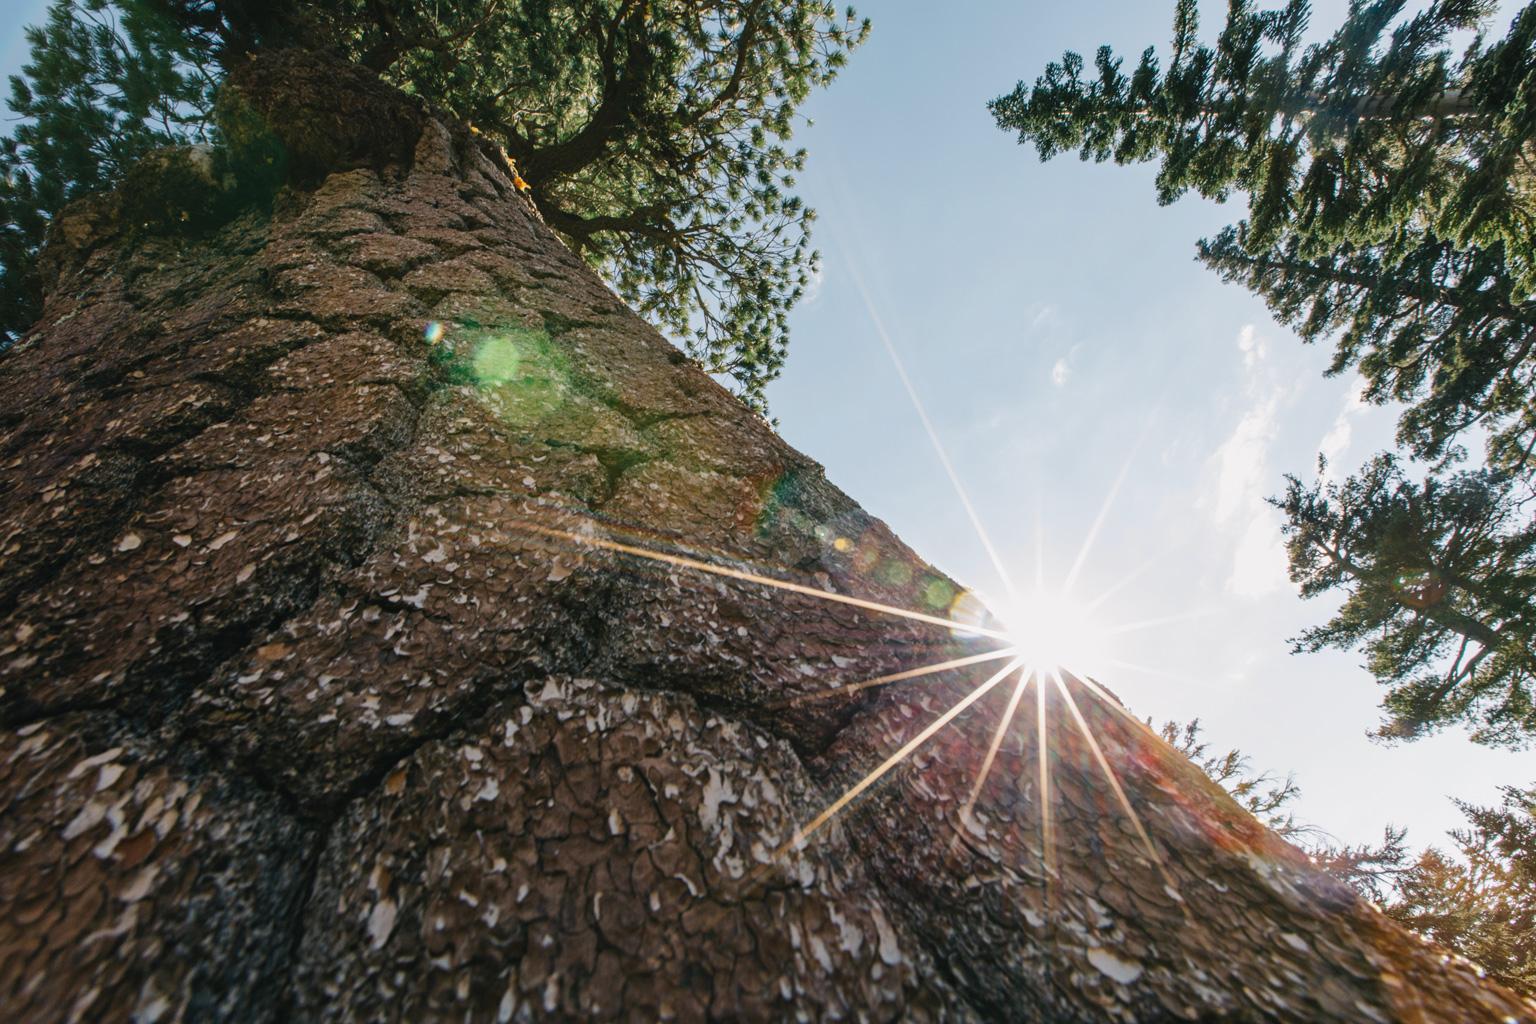 CindyGiovagnoli_outdoors_photographer_Sierra_Buttes_firetower_watchtower_Sardine_Snag_Bear_lake_hike_swim_camp-038.jpg